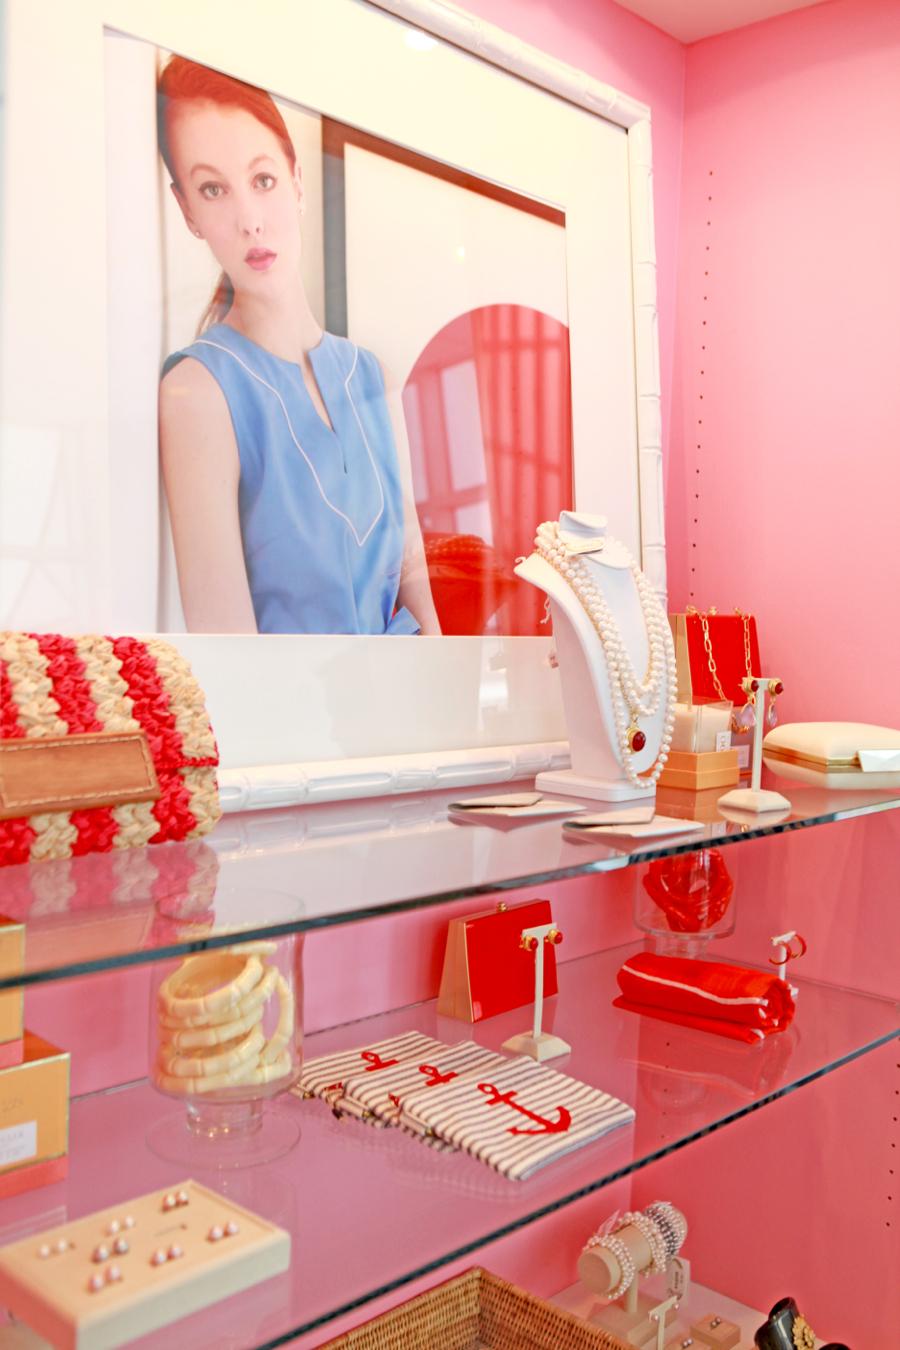 Kayce-hughes-home-nashville-fashion-designer-matchbook-magazine-14